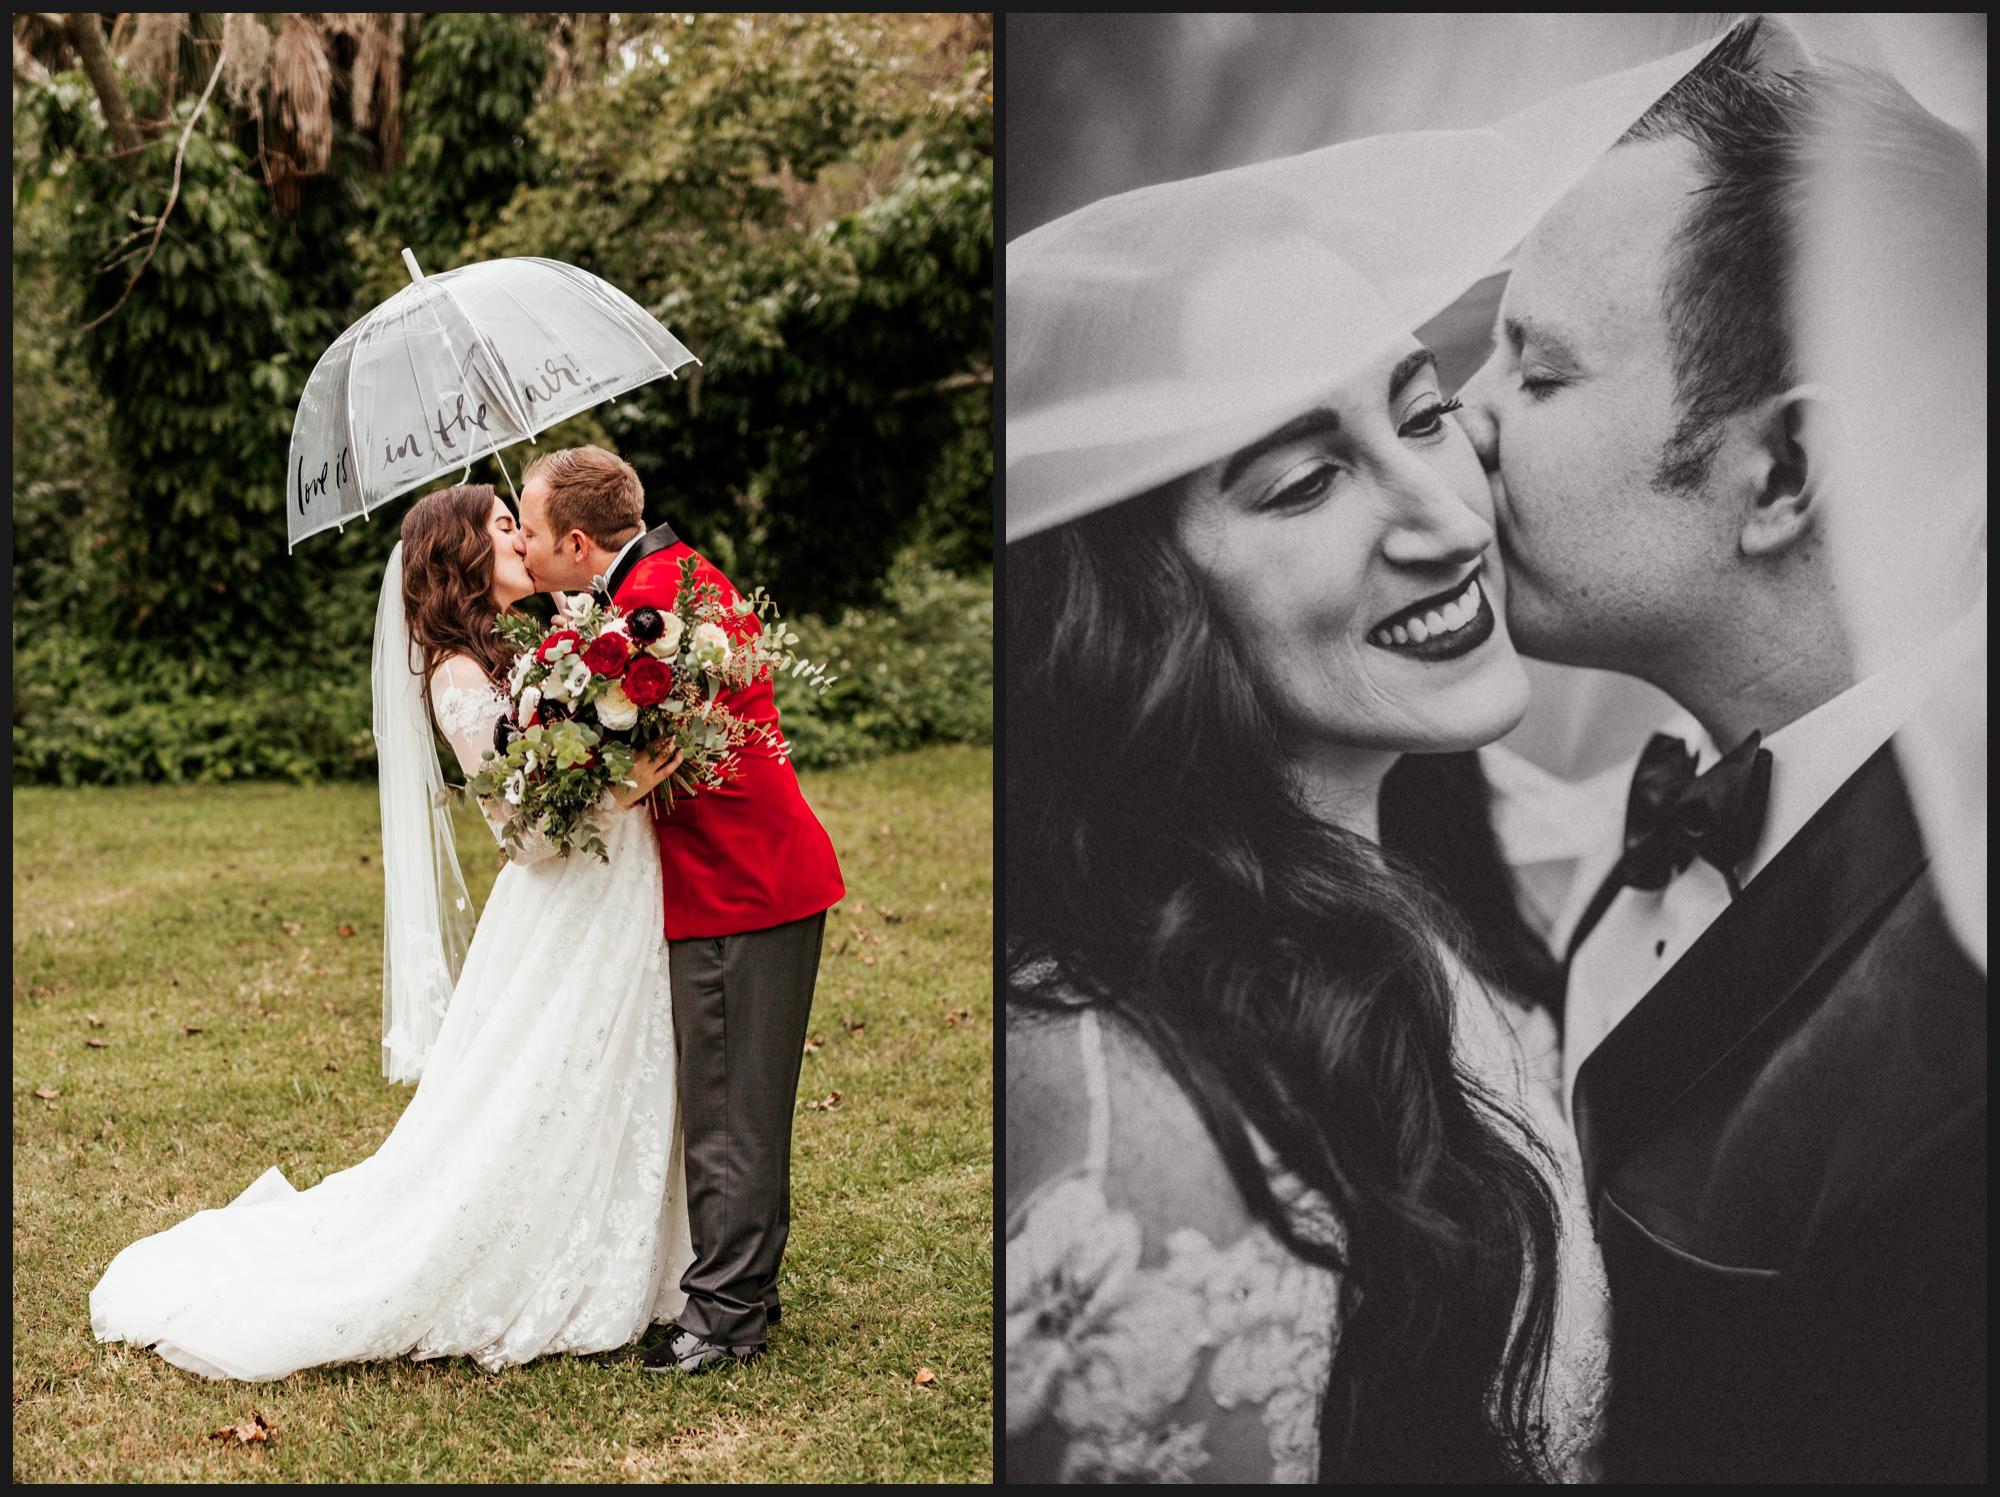 Orlando-Wedding-Photographer-destination-wedding-photographer-florida-wedding-photographer-hawaii-wedding-photographer_0481.jpg